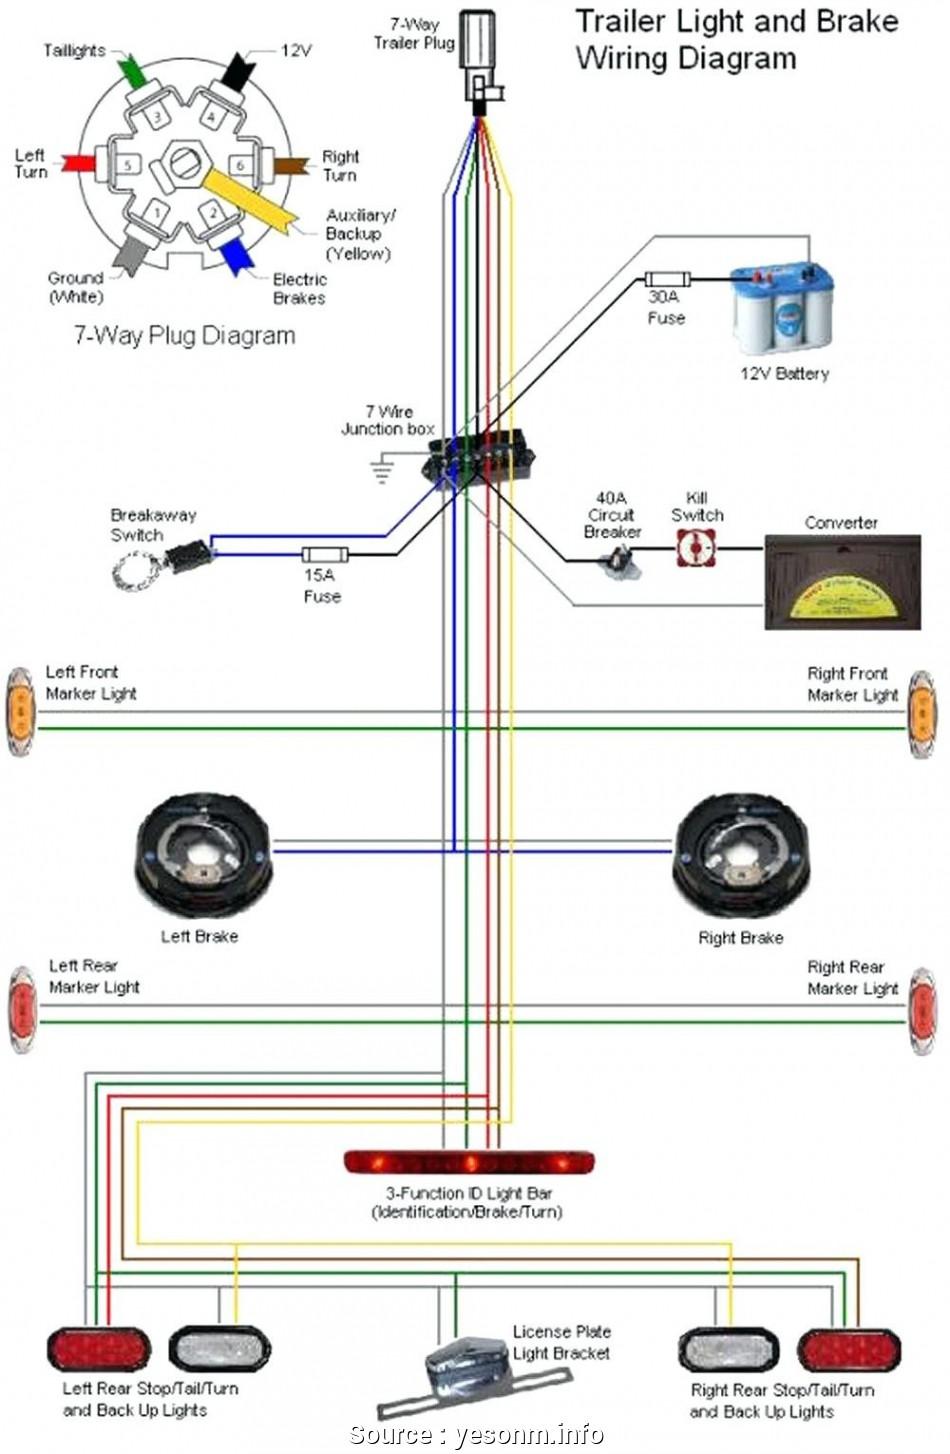 5 wire wiring diagram wy 7627  5 wire flat wiring diagram download diagram 5 wire trailer wiring diagram wy 7627  5 wire flat wiring diagram